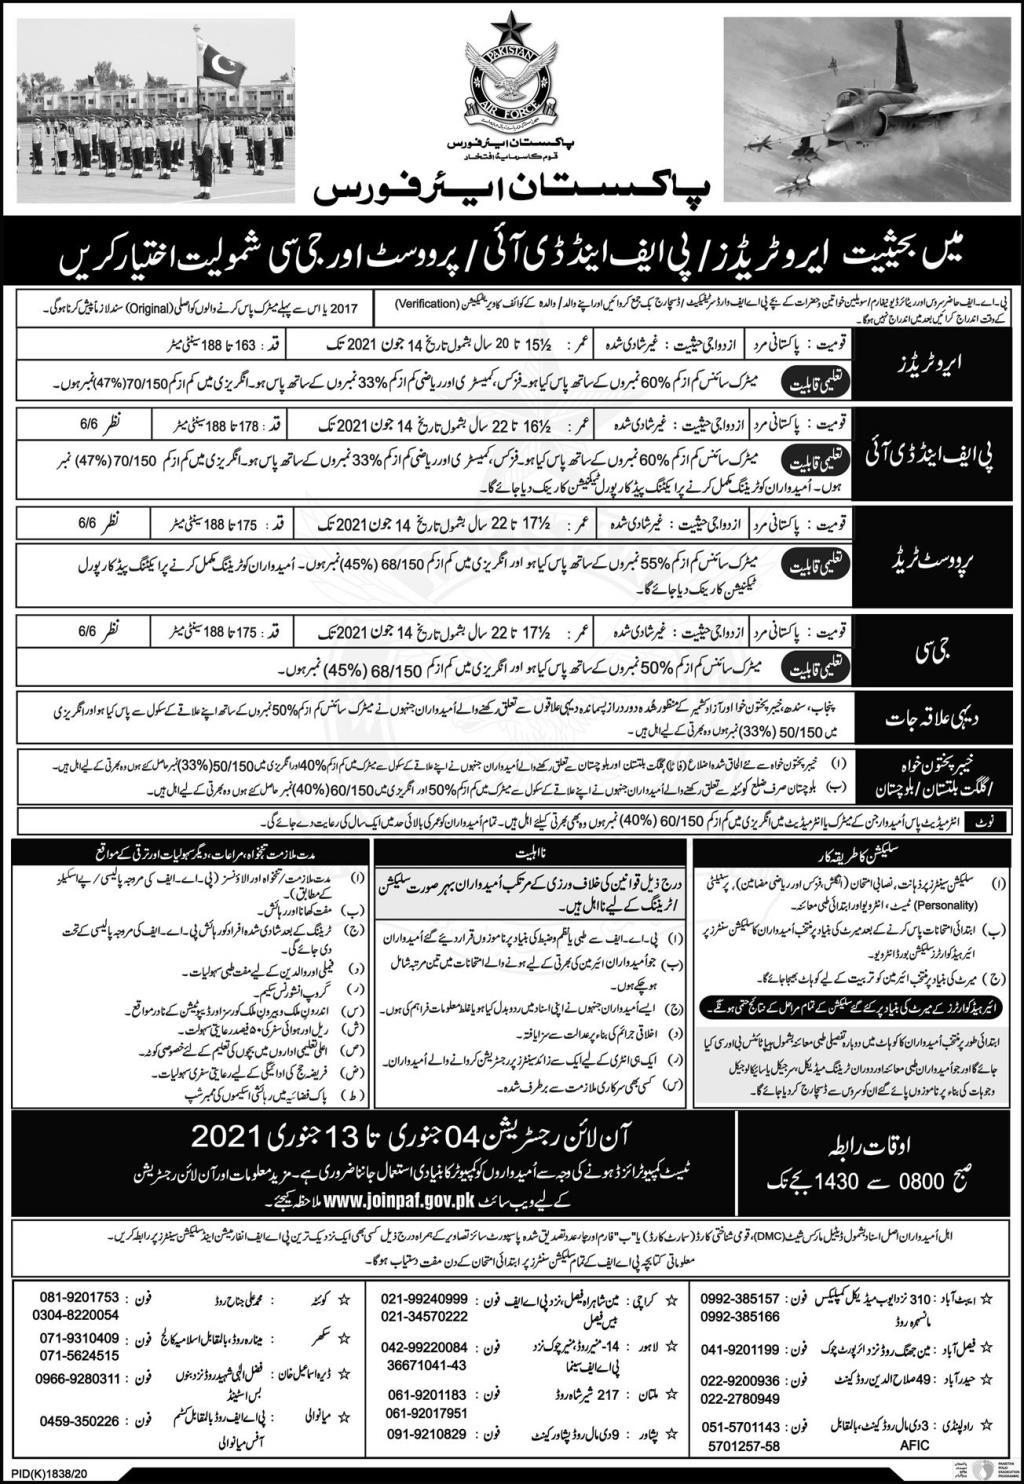 Pakistan Air Force PAF January Jobs 2021